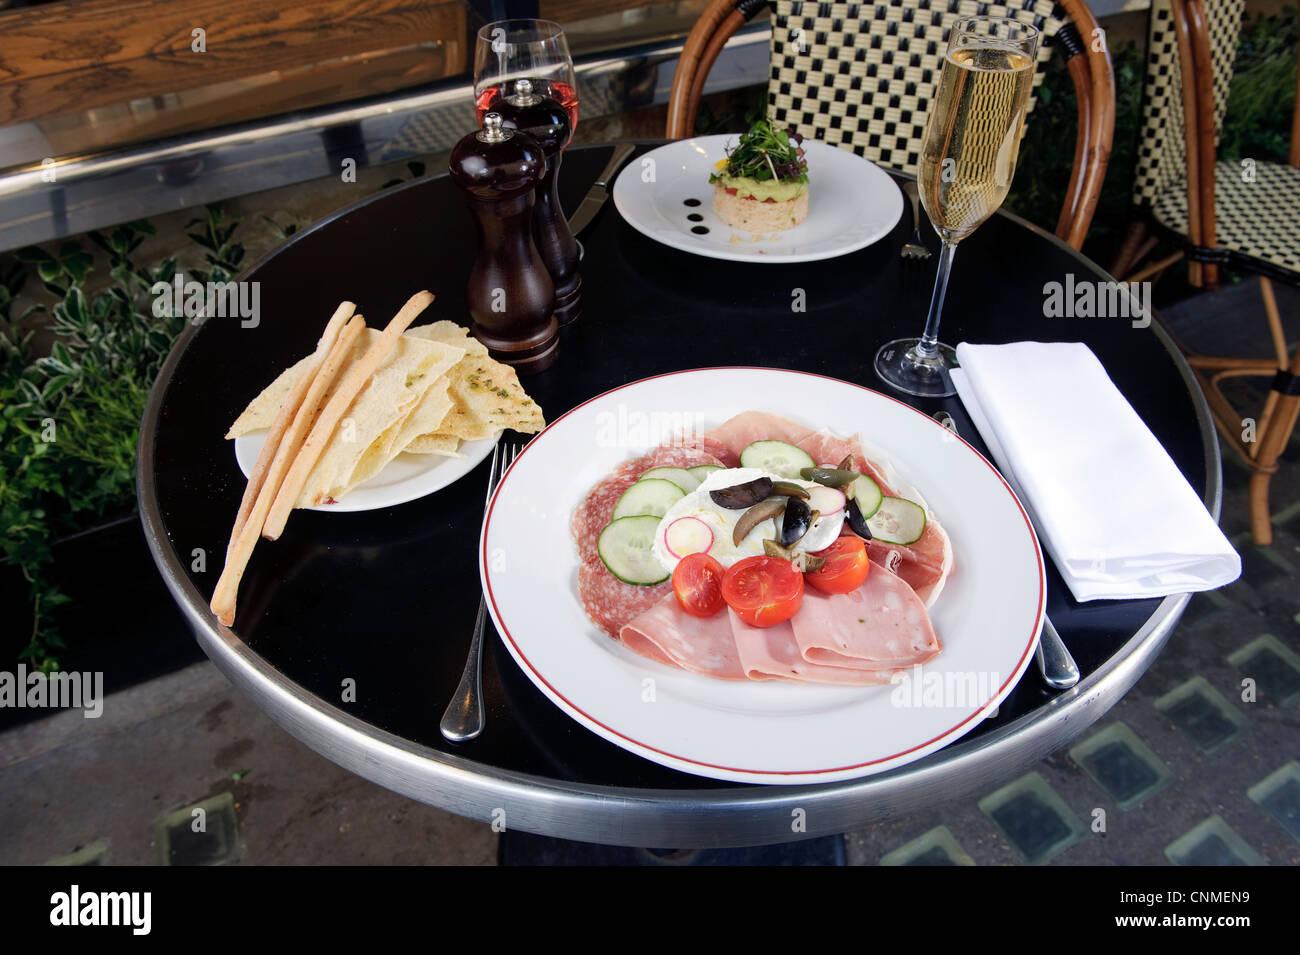 posh single restaurant meal on table outside - Stock Image